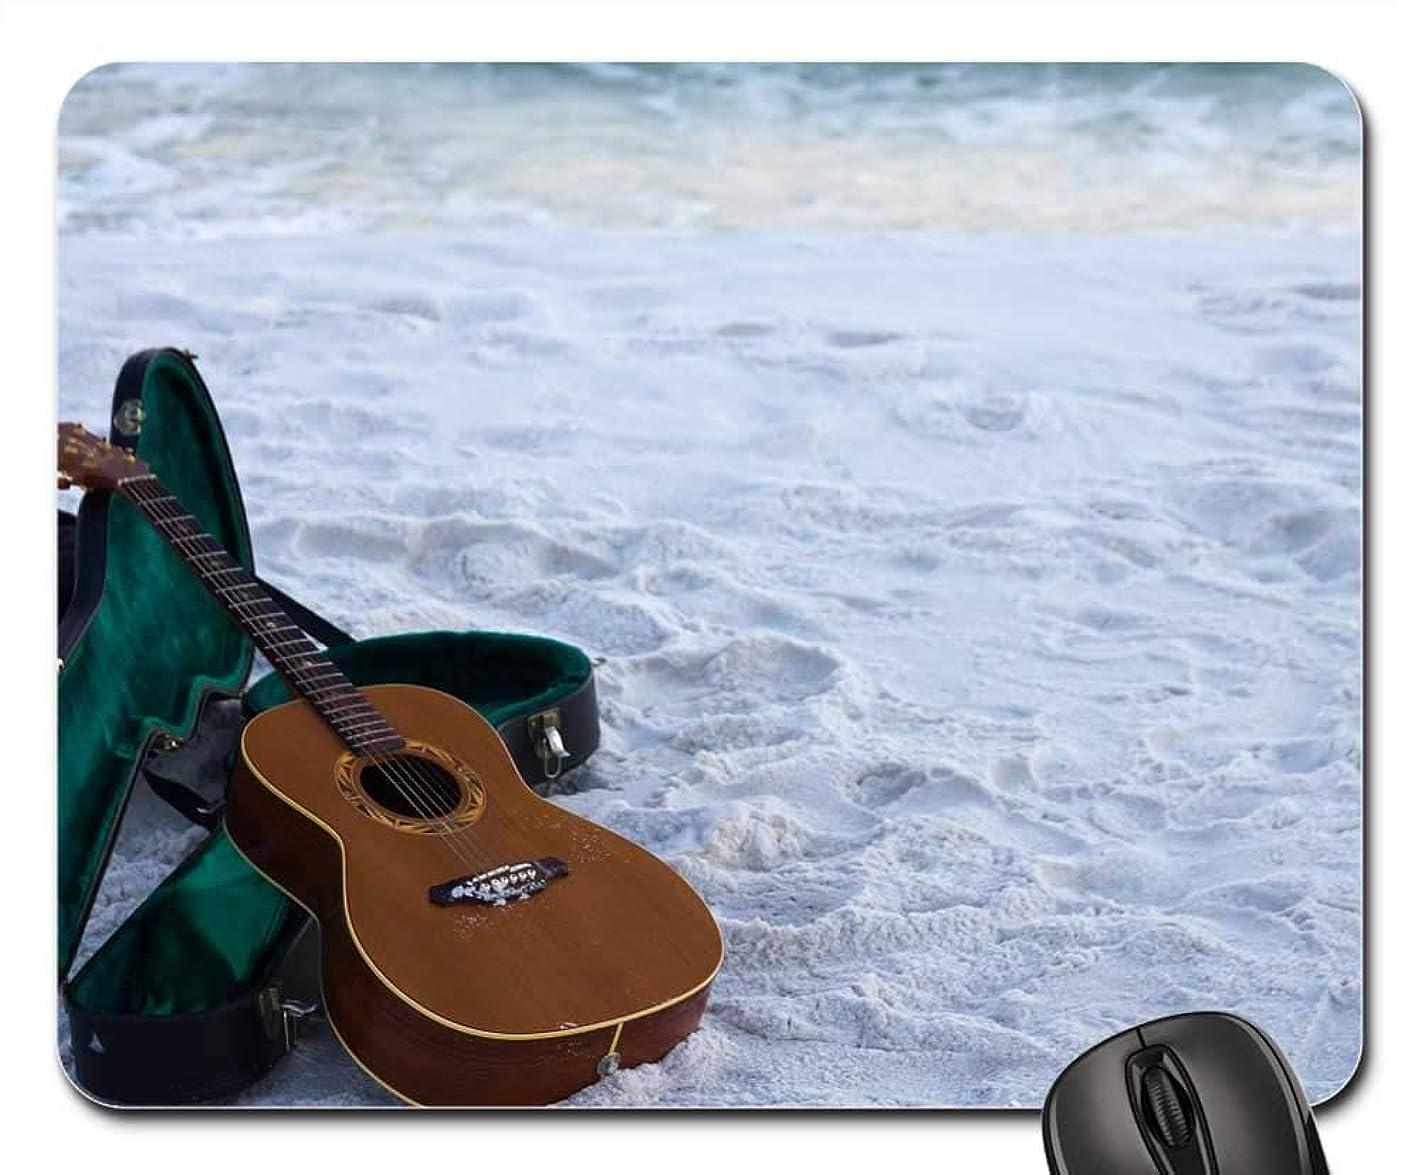 Mouse Pads - Guitar Sand Instrument Acoustic Travel Ocean